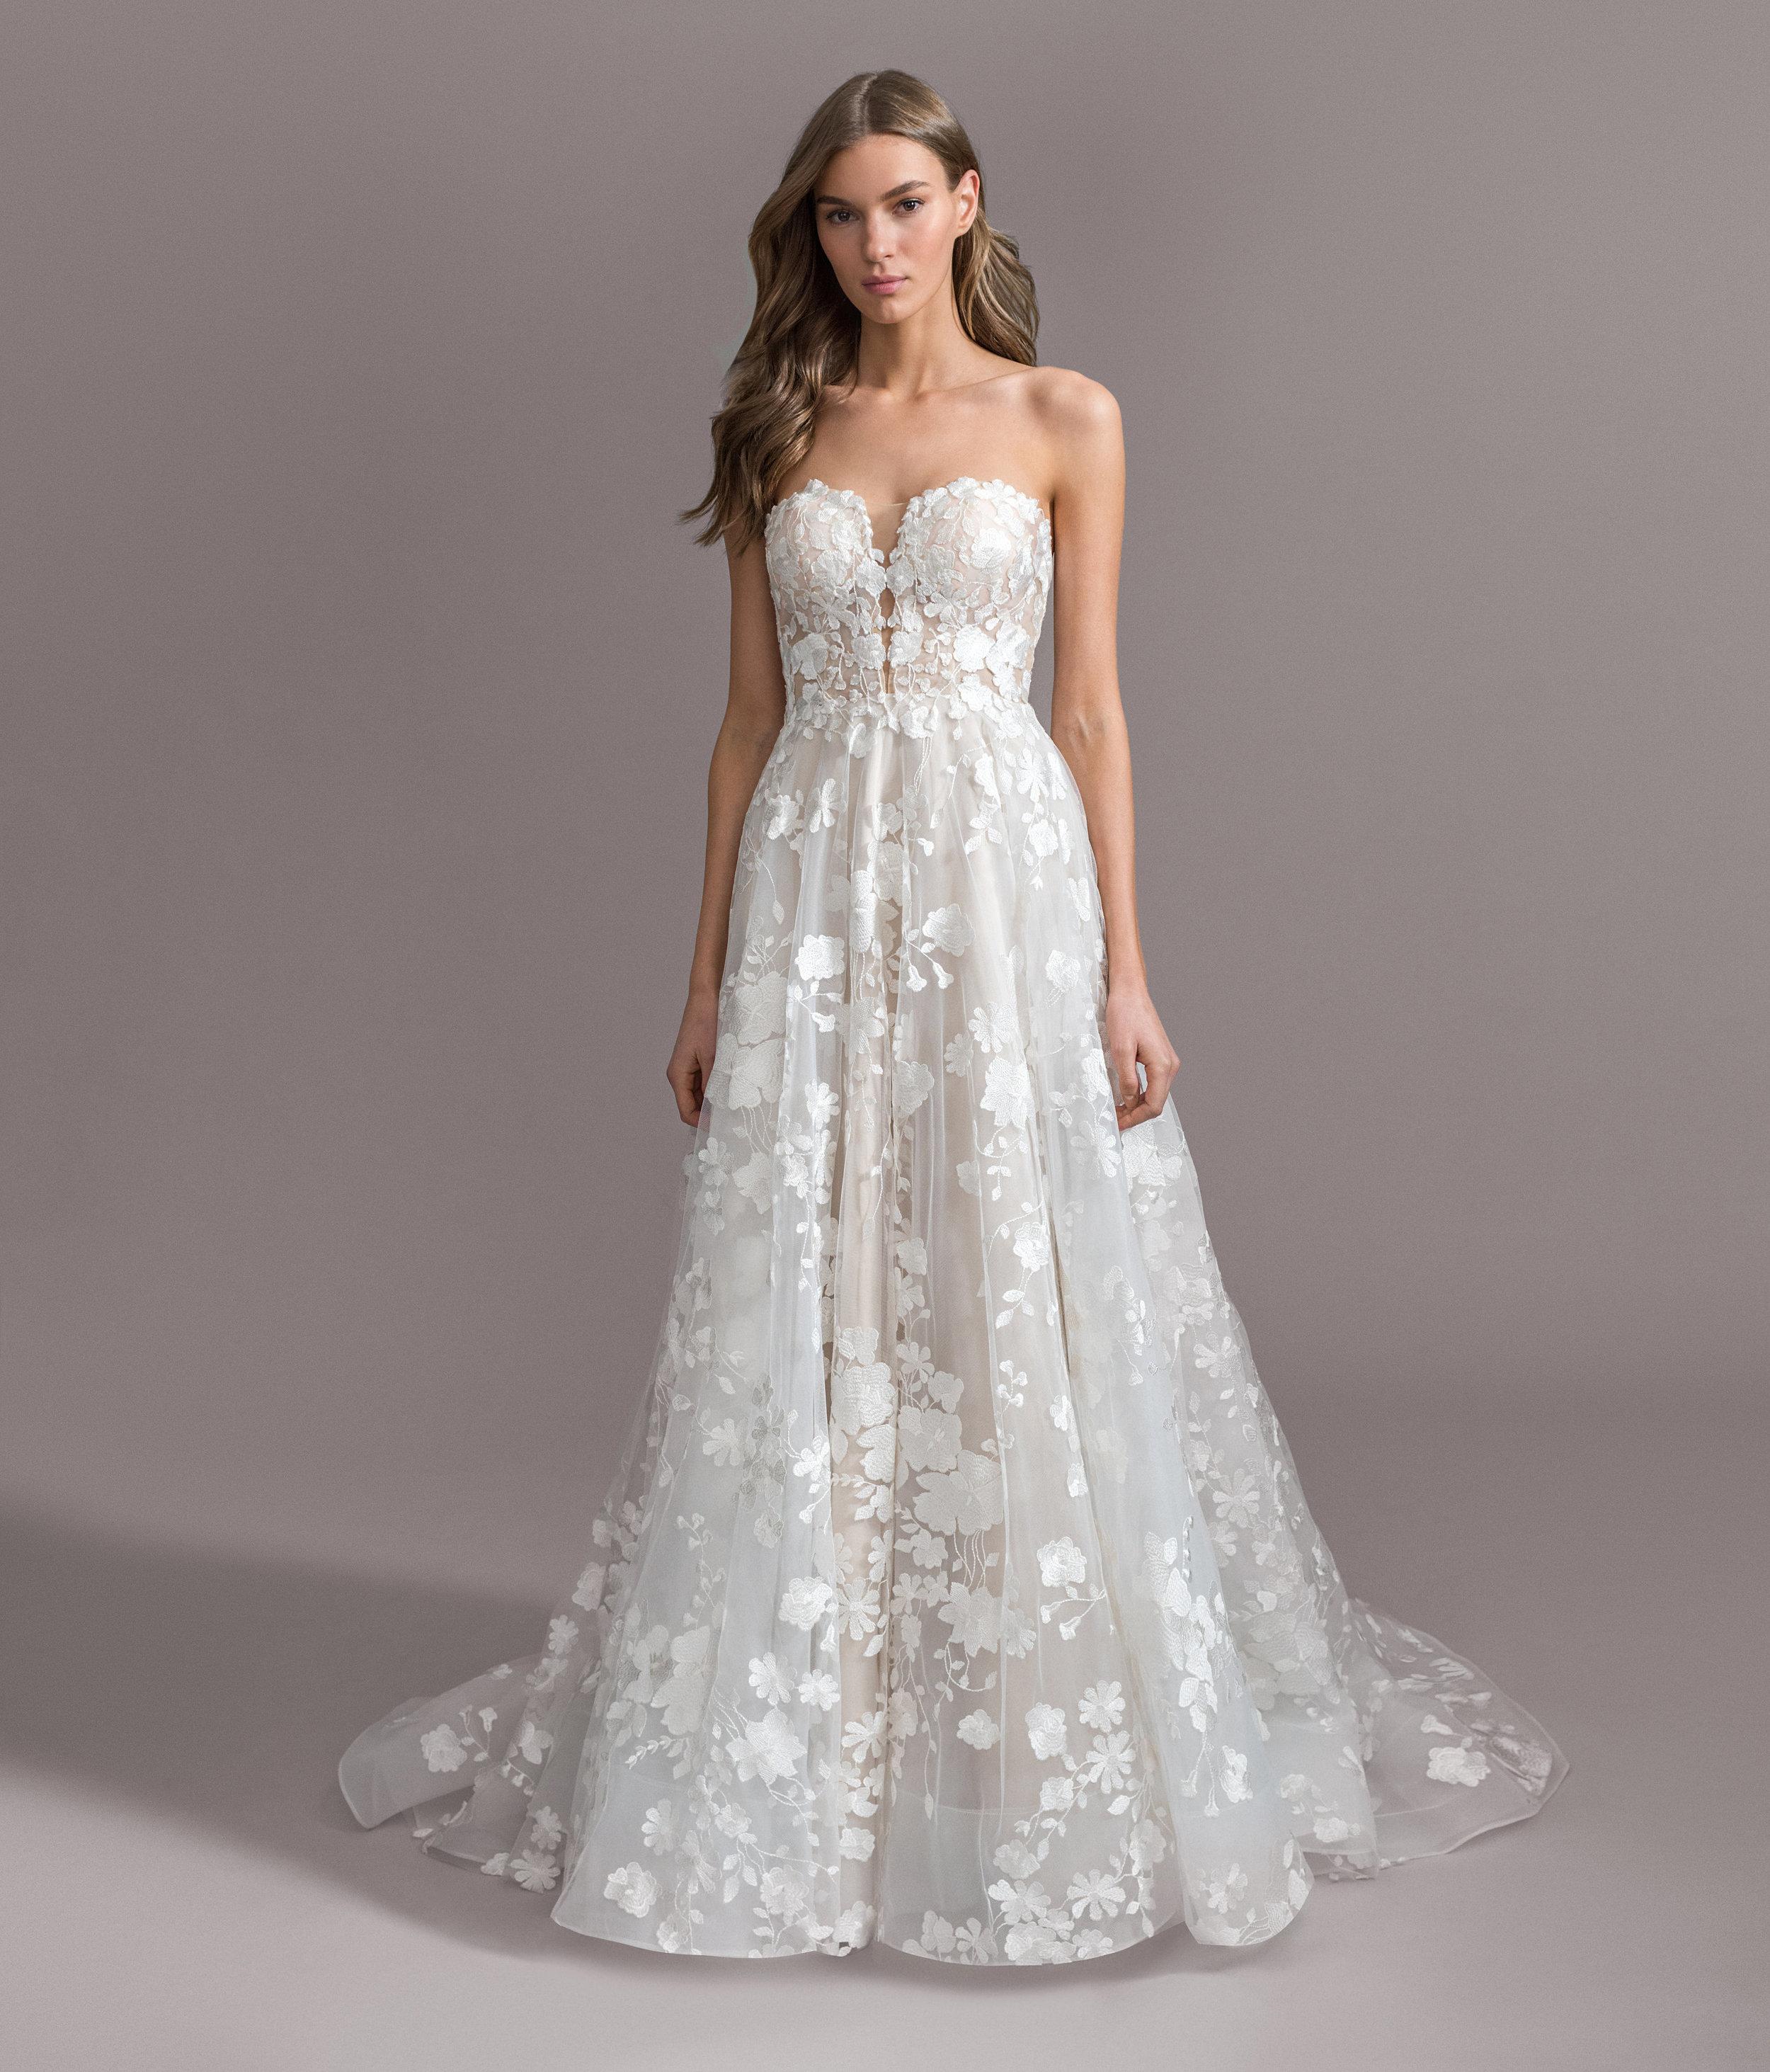 ti-adora-bridal-fall-2019-style-7961-arwen_1.jpg